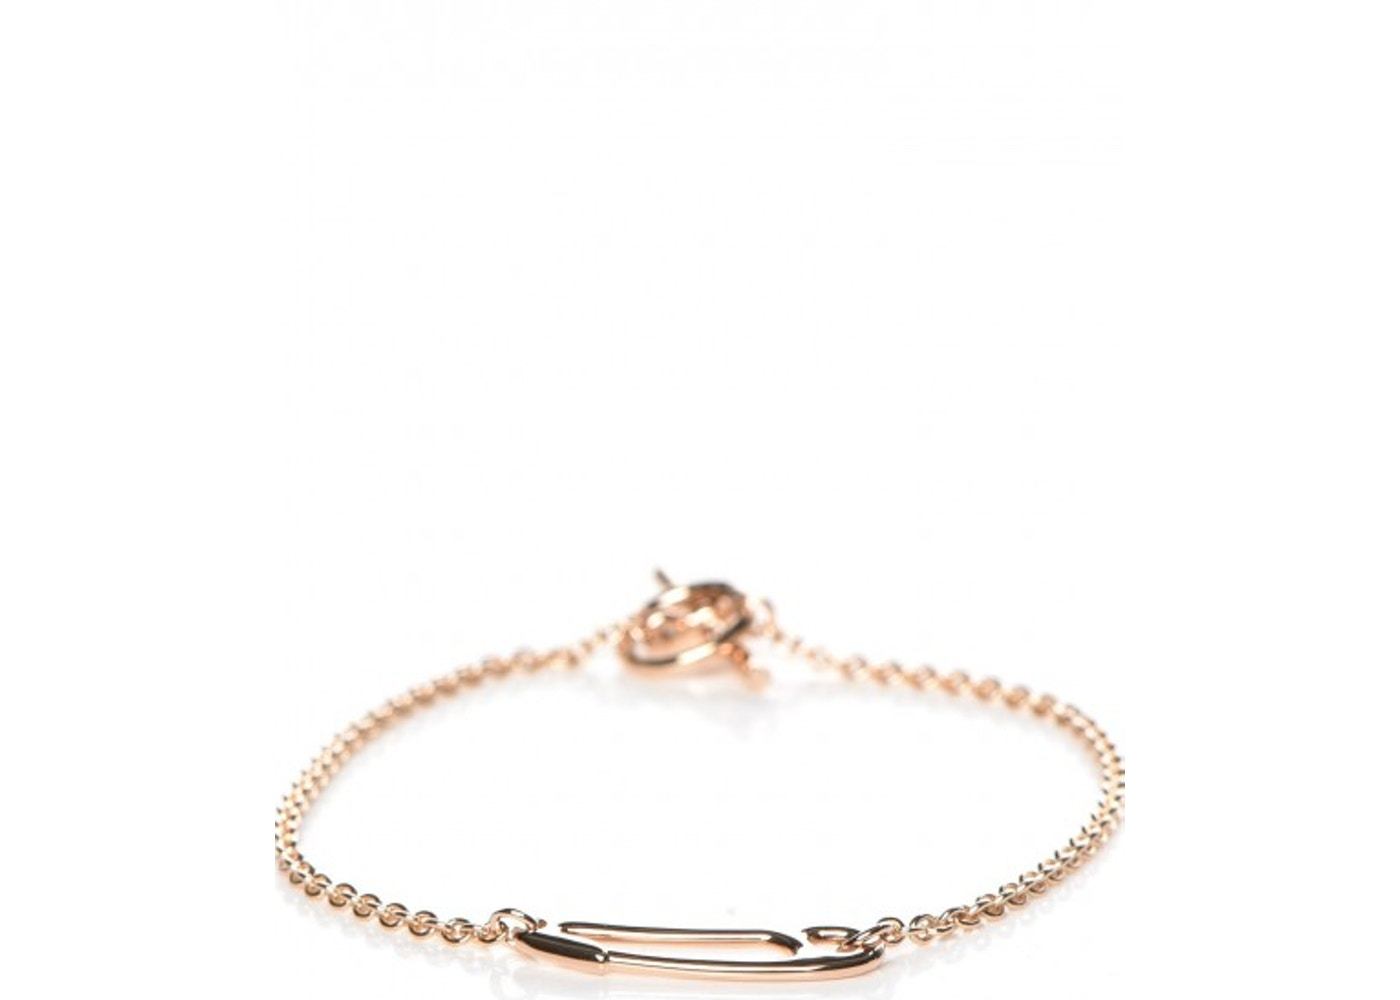 986437ba653952 Buy & Sell Hermes Jewelry Handbags - Release Date